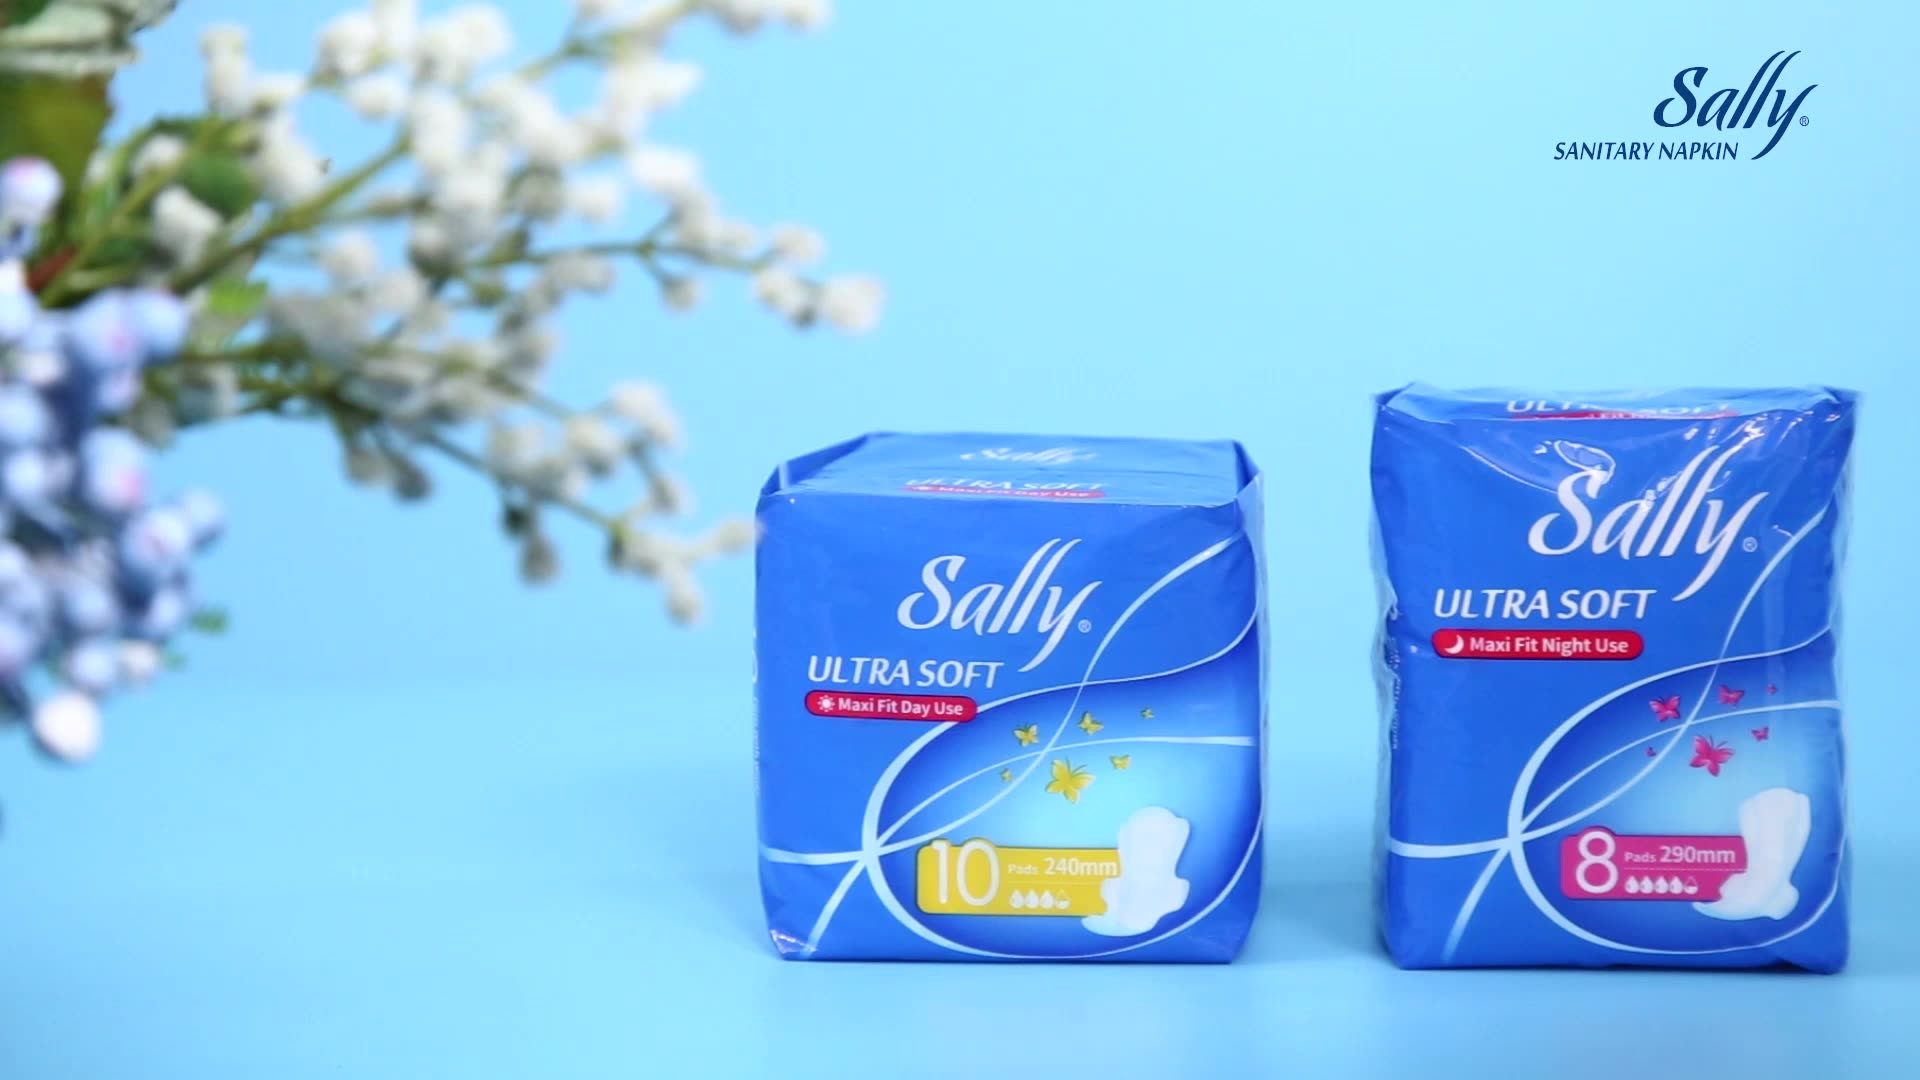 Sally brand disposable cotton ladies anion 350mm overnight sanitary napkin